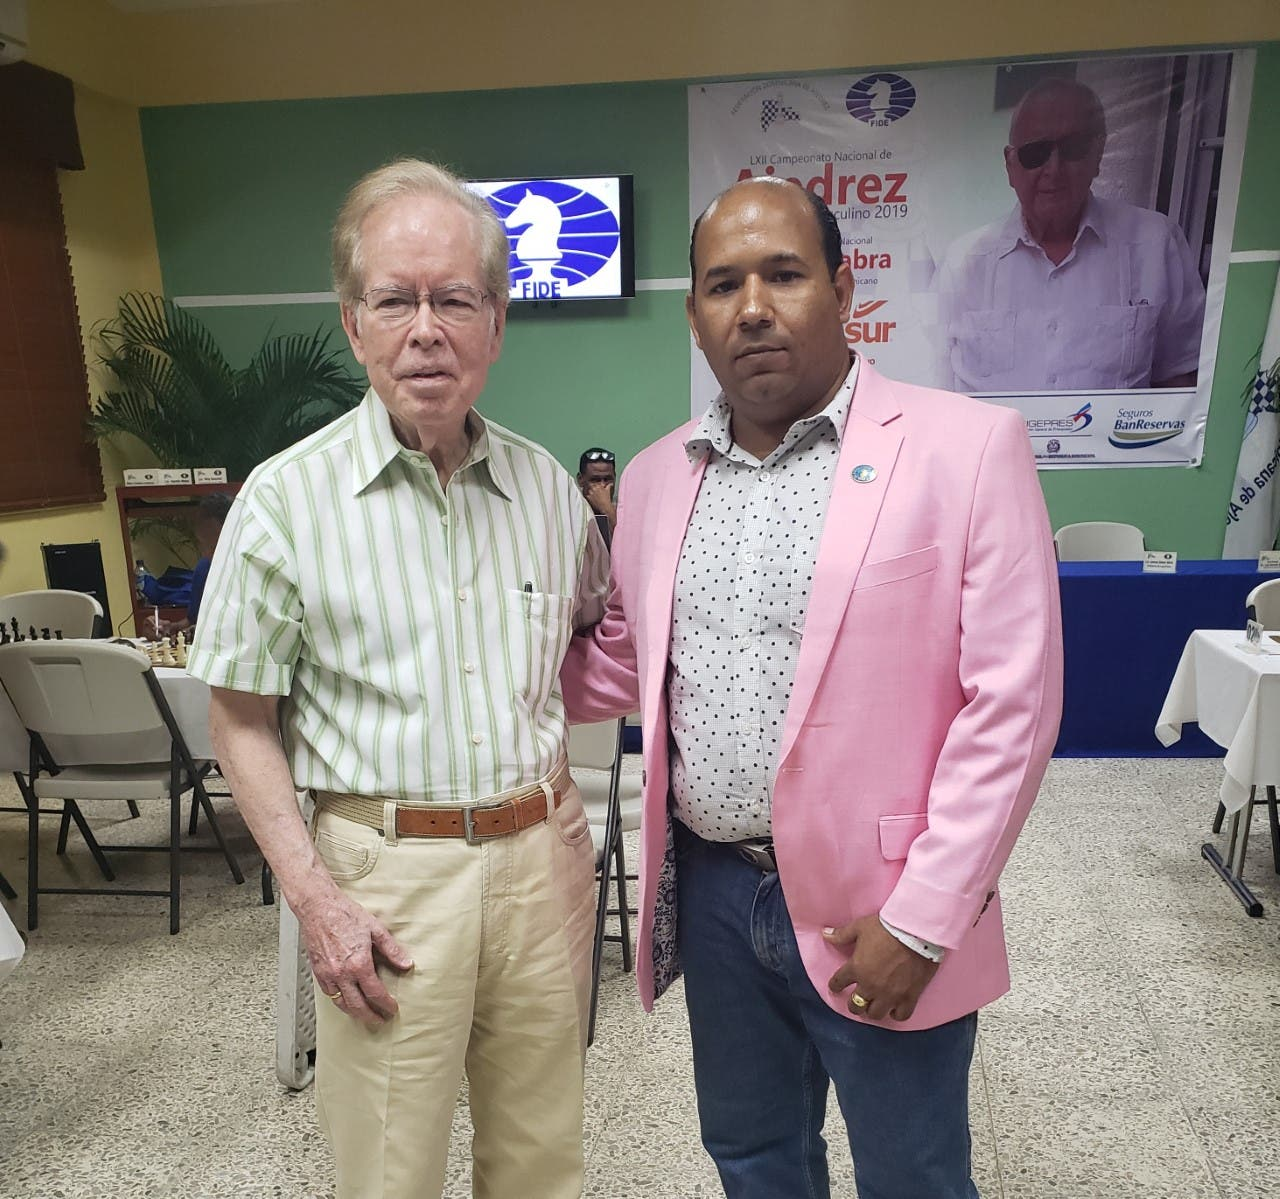 Copa Corripio de ajedrez virtual, dedicada a Don Pepín Corripio, inicia este domingo con 200 participantes